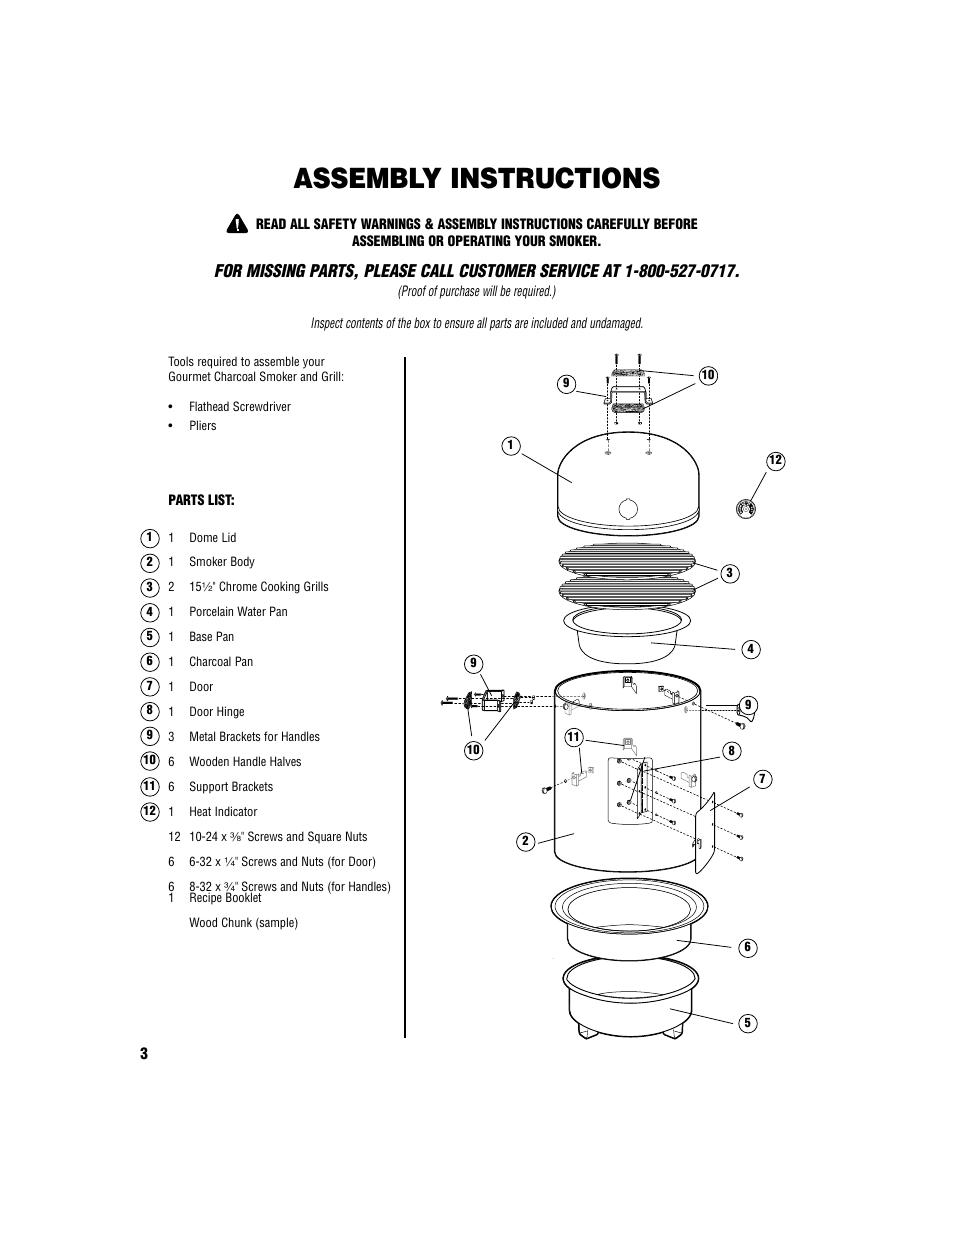 Voltage Regulator Smoke Manual Guide